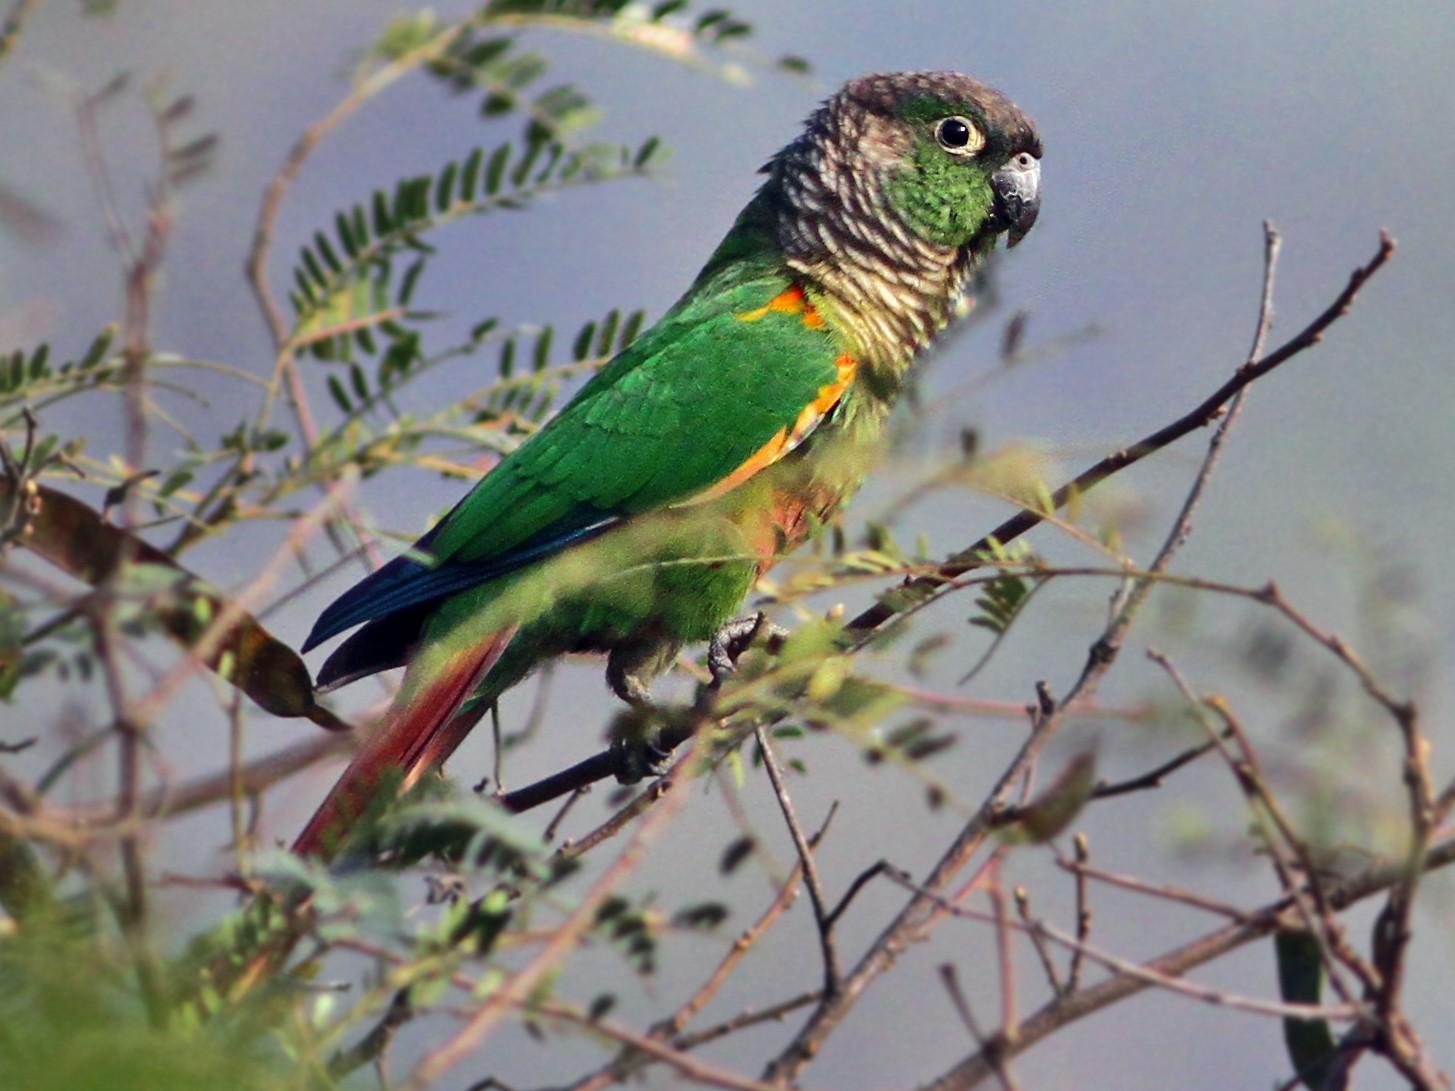 Green-cheeked Parakeet - Andrew Spencer